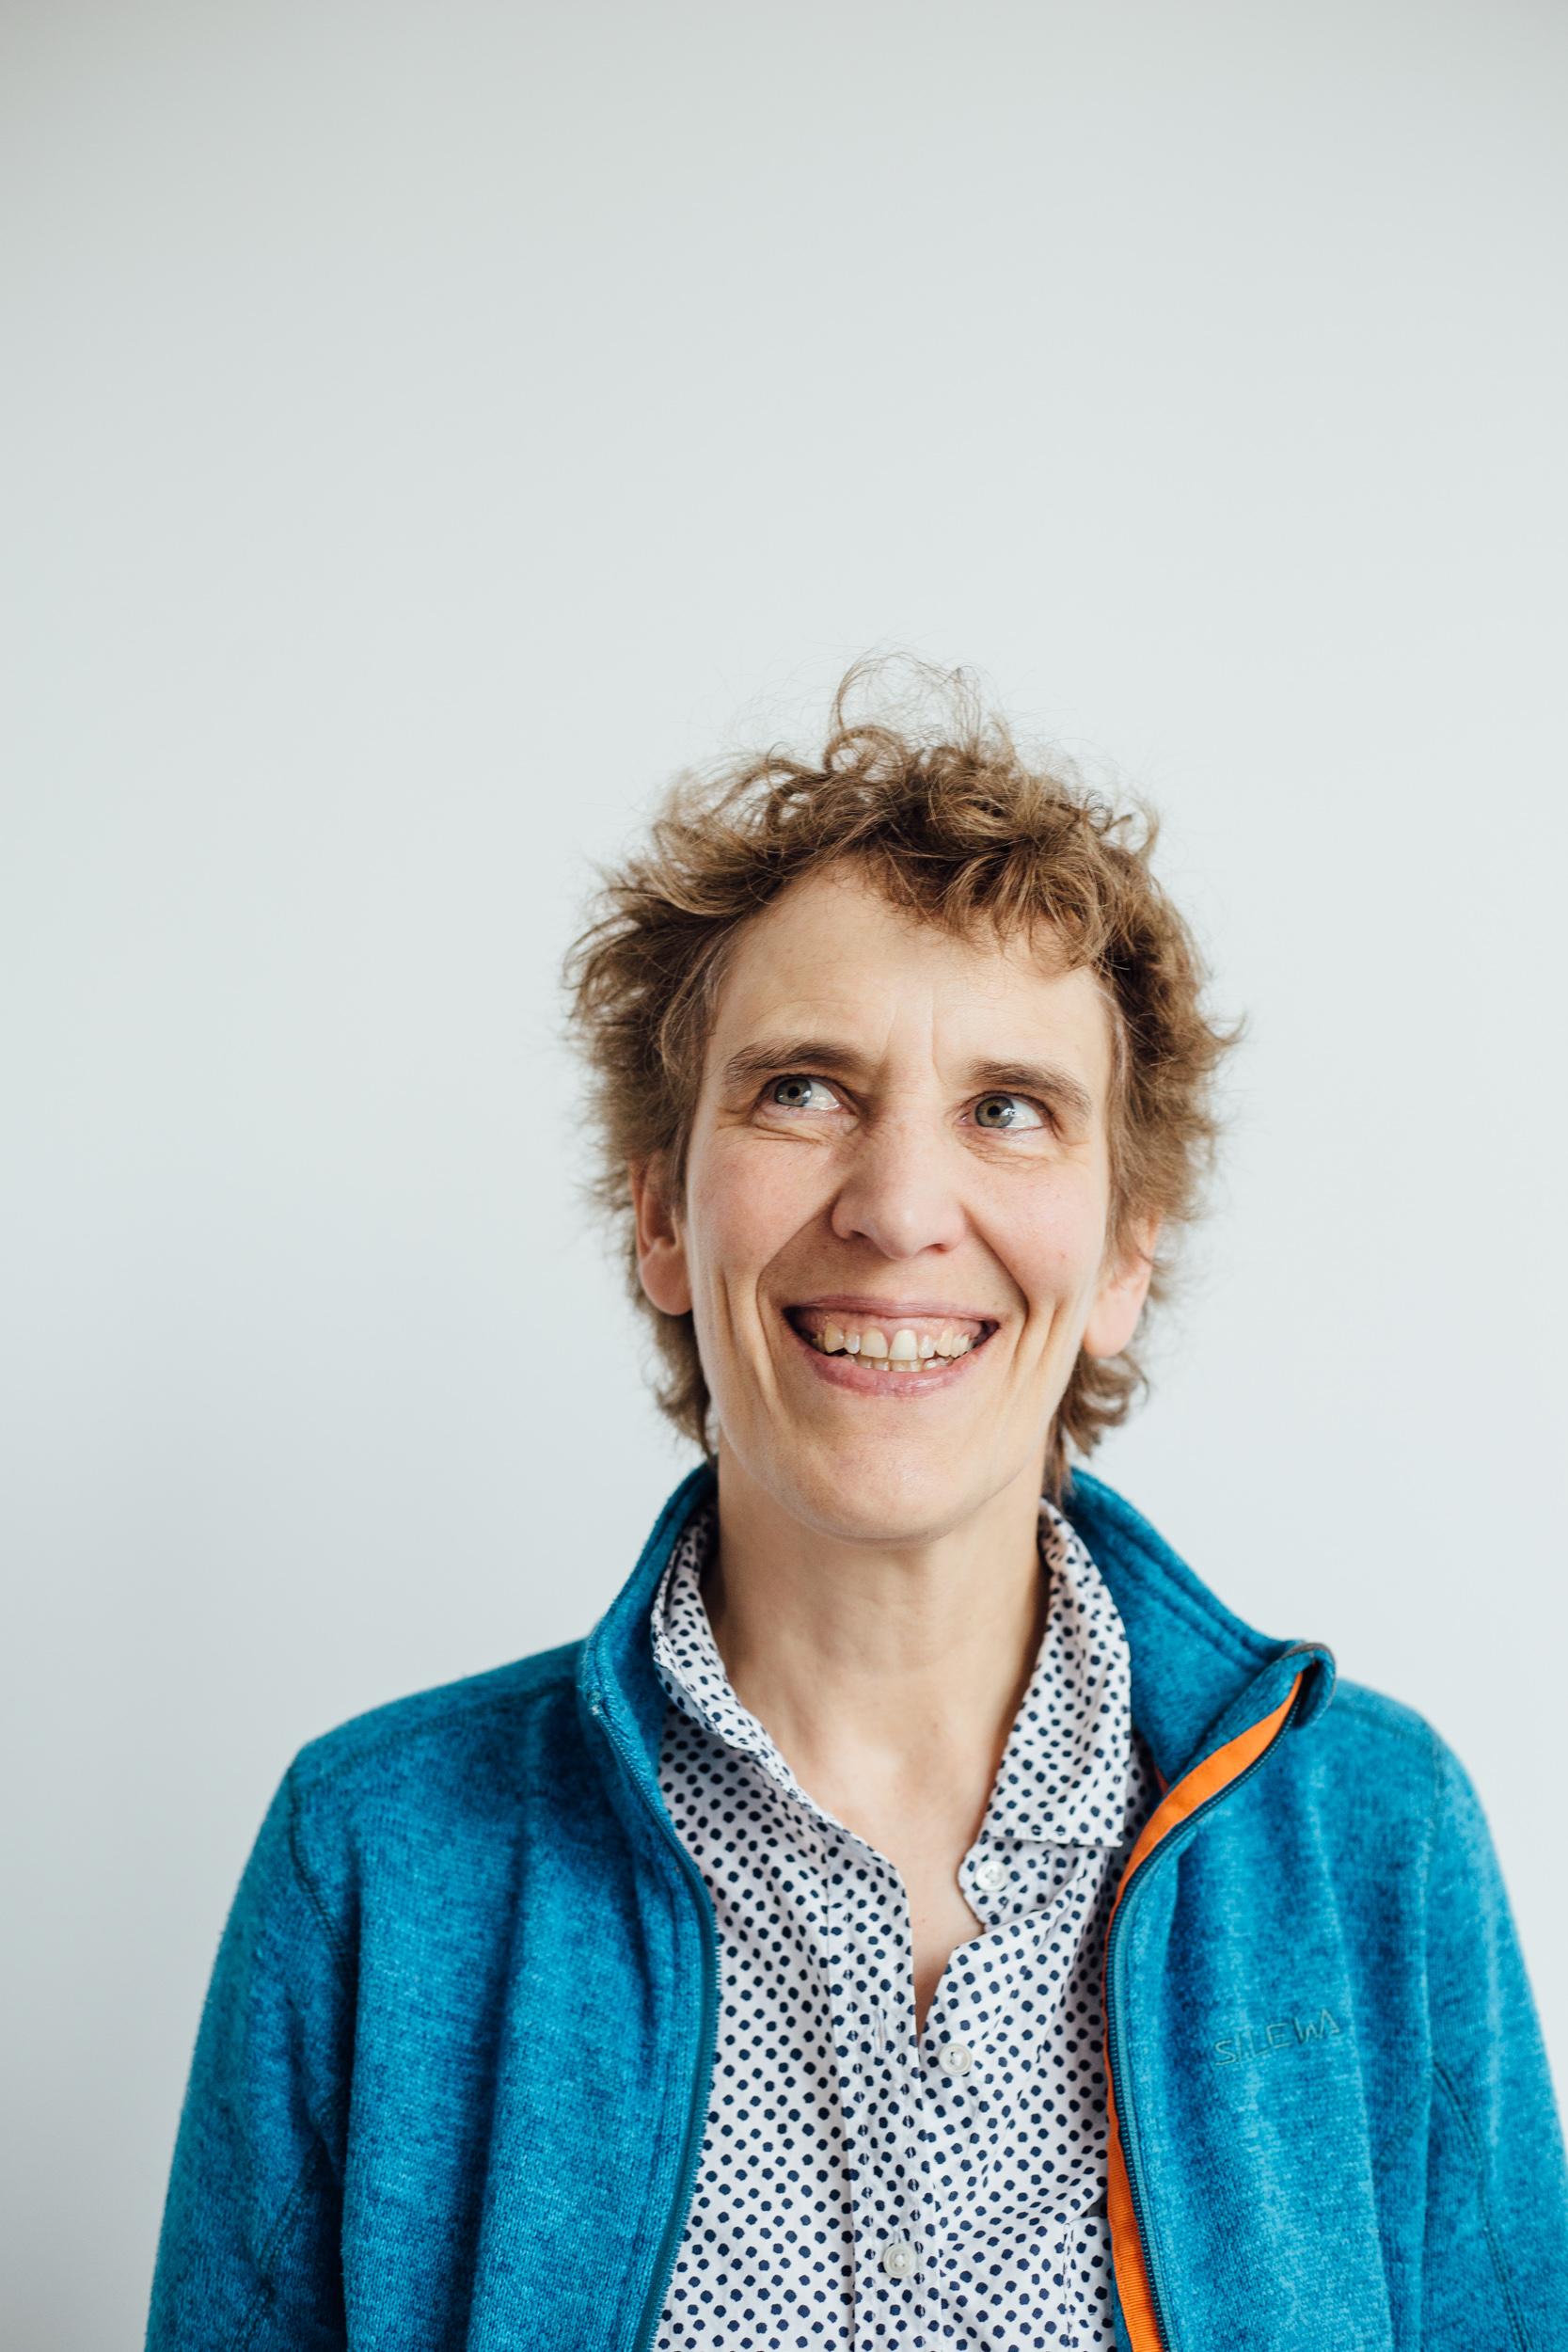 : Heike Tiemann - Professor of Sport Pedagogy